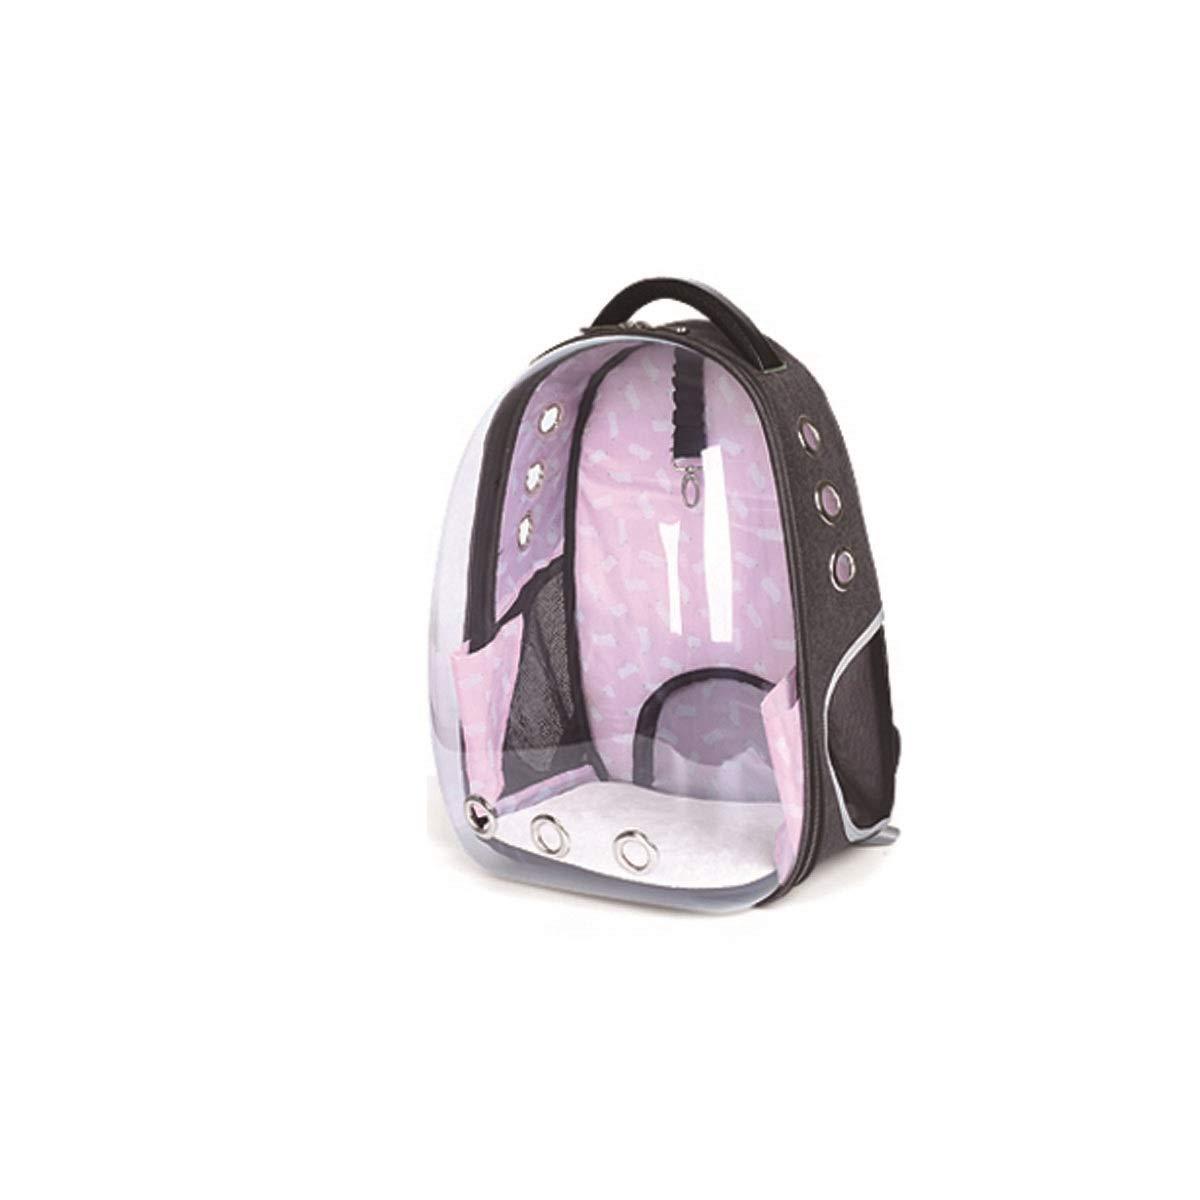 HENGTONGTONGXUN Portable Breathable Pet Carrier, Backpack Outing Cat Carrier, Pet Backpack Carrier, bluee, Green, Black, Purple, Pink Bite resistant, wear resistant, washable (color   Pink)